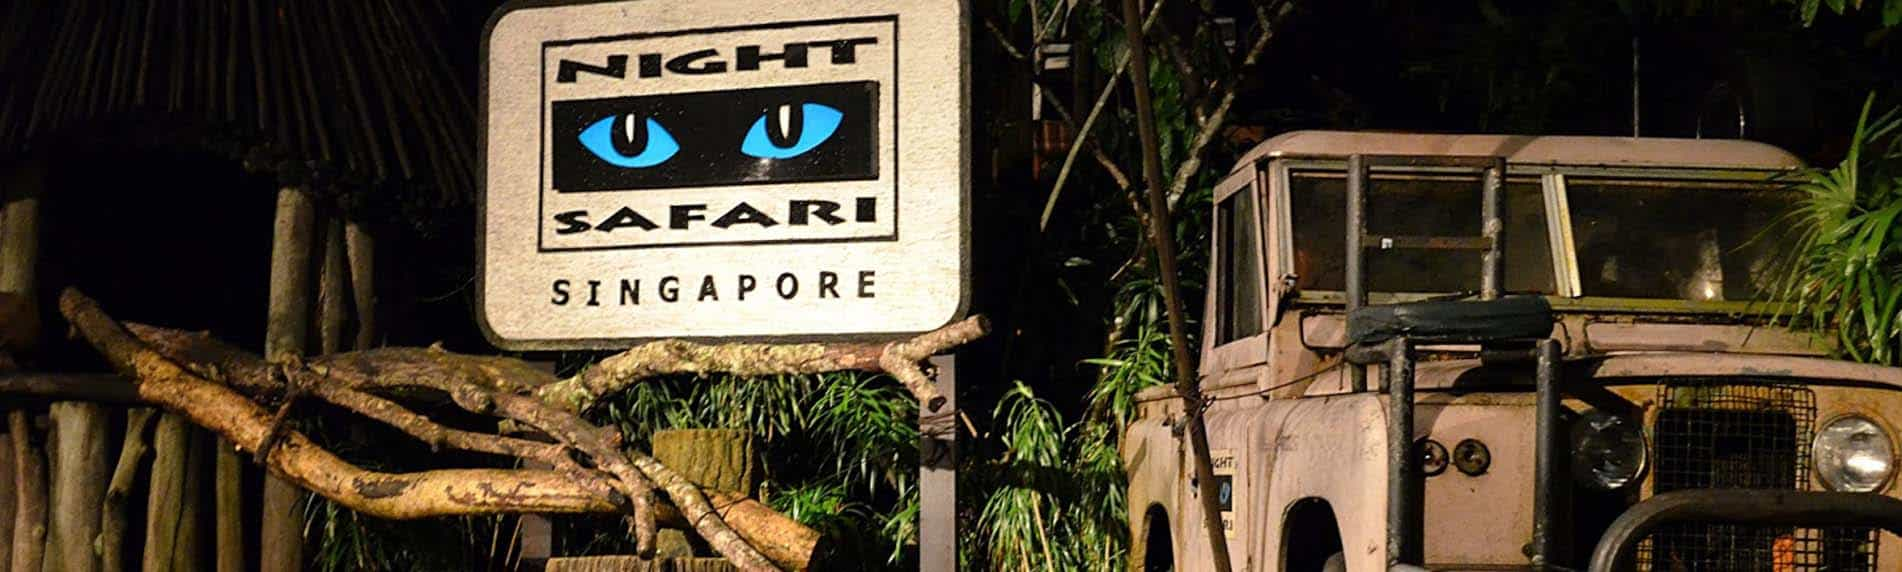 night safari adventure singapore